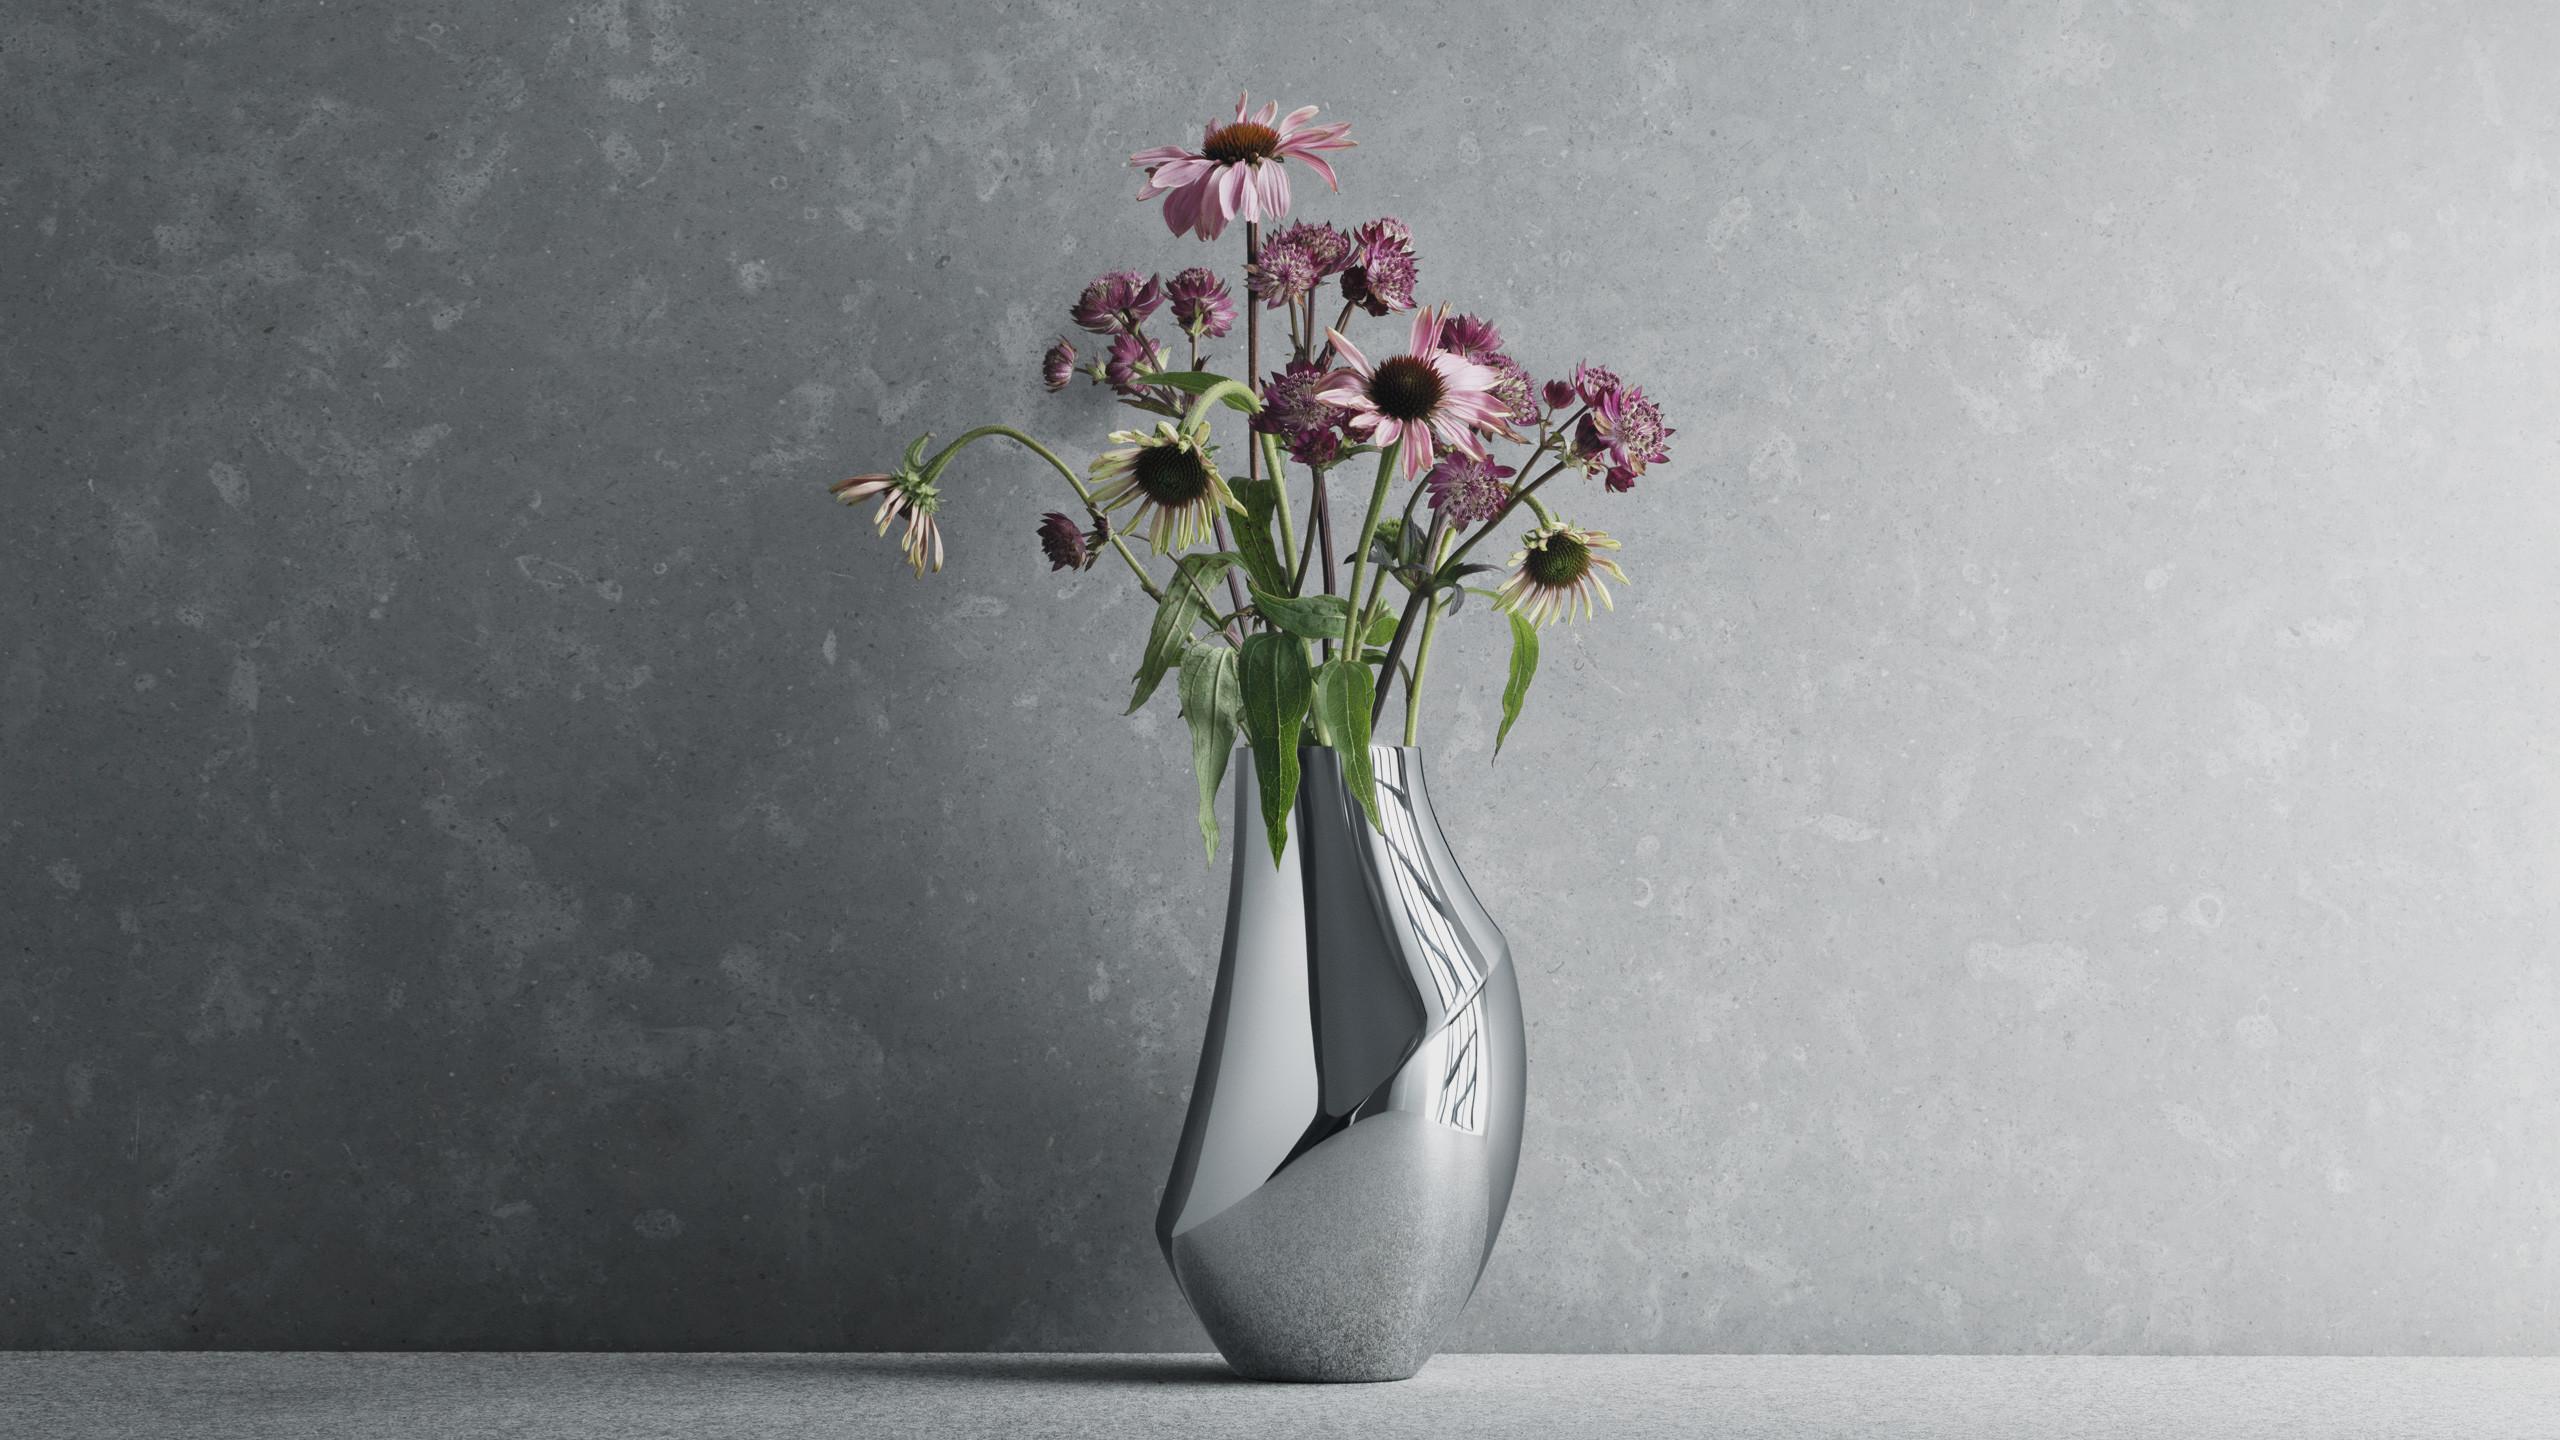 georg jensen living vase of creative direction todd bracher studio throughout tags